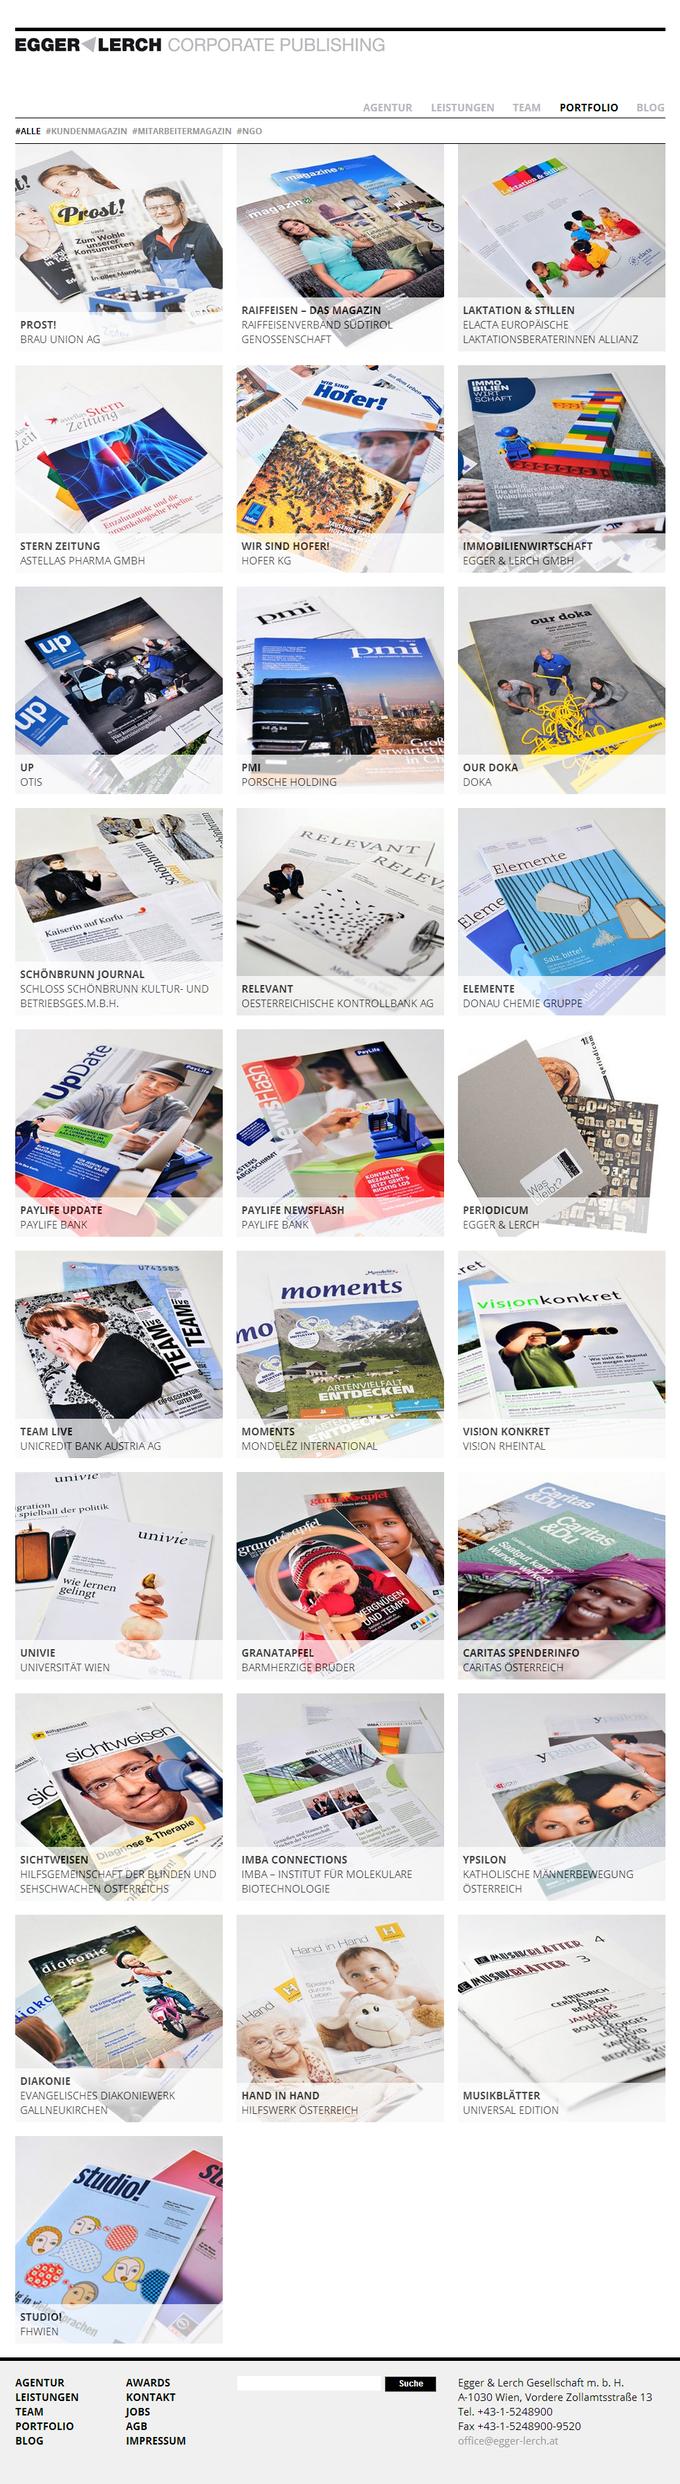 Egger & Lerch - Corporate Publishing - Portfolio Screenshot